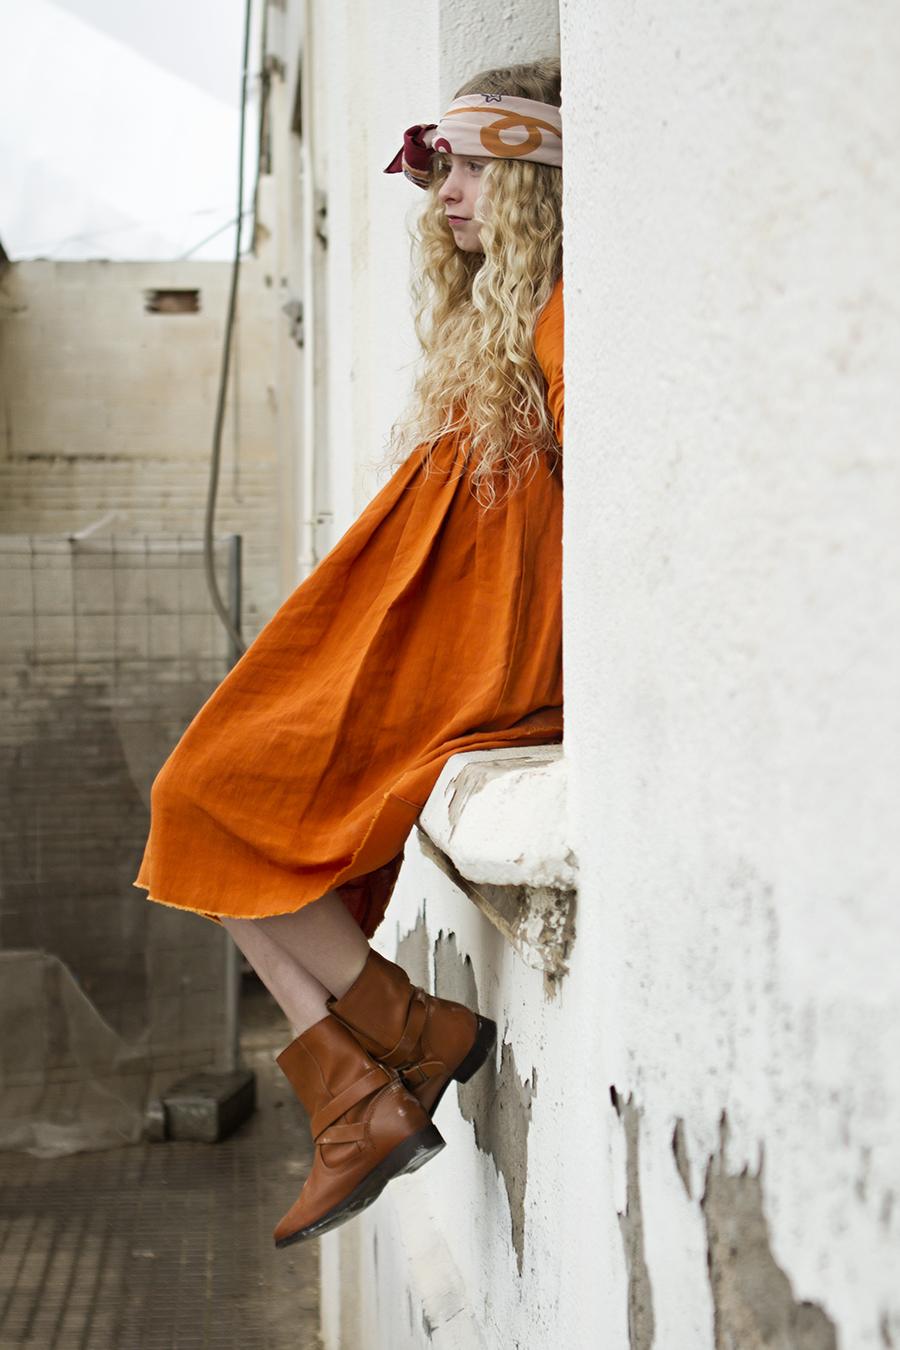 look-1-little-creative-factory-fotografa-de-moda-fashion-kids-outfit-street-style-fotografo-barcelona-14